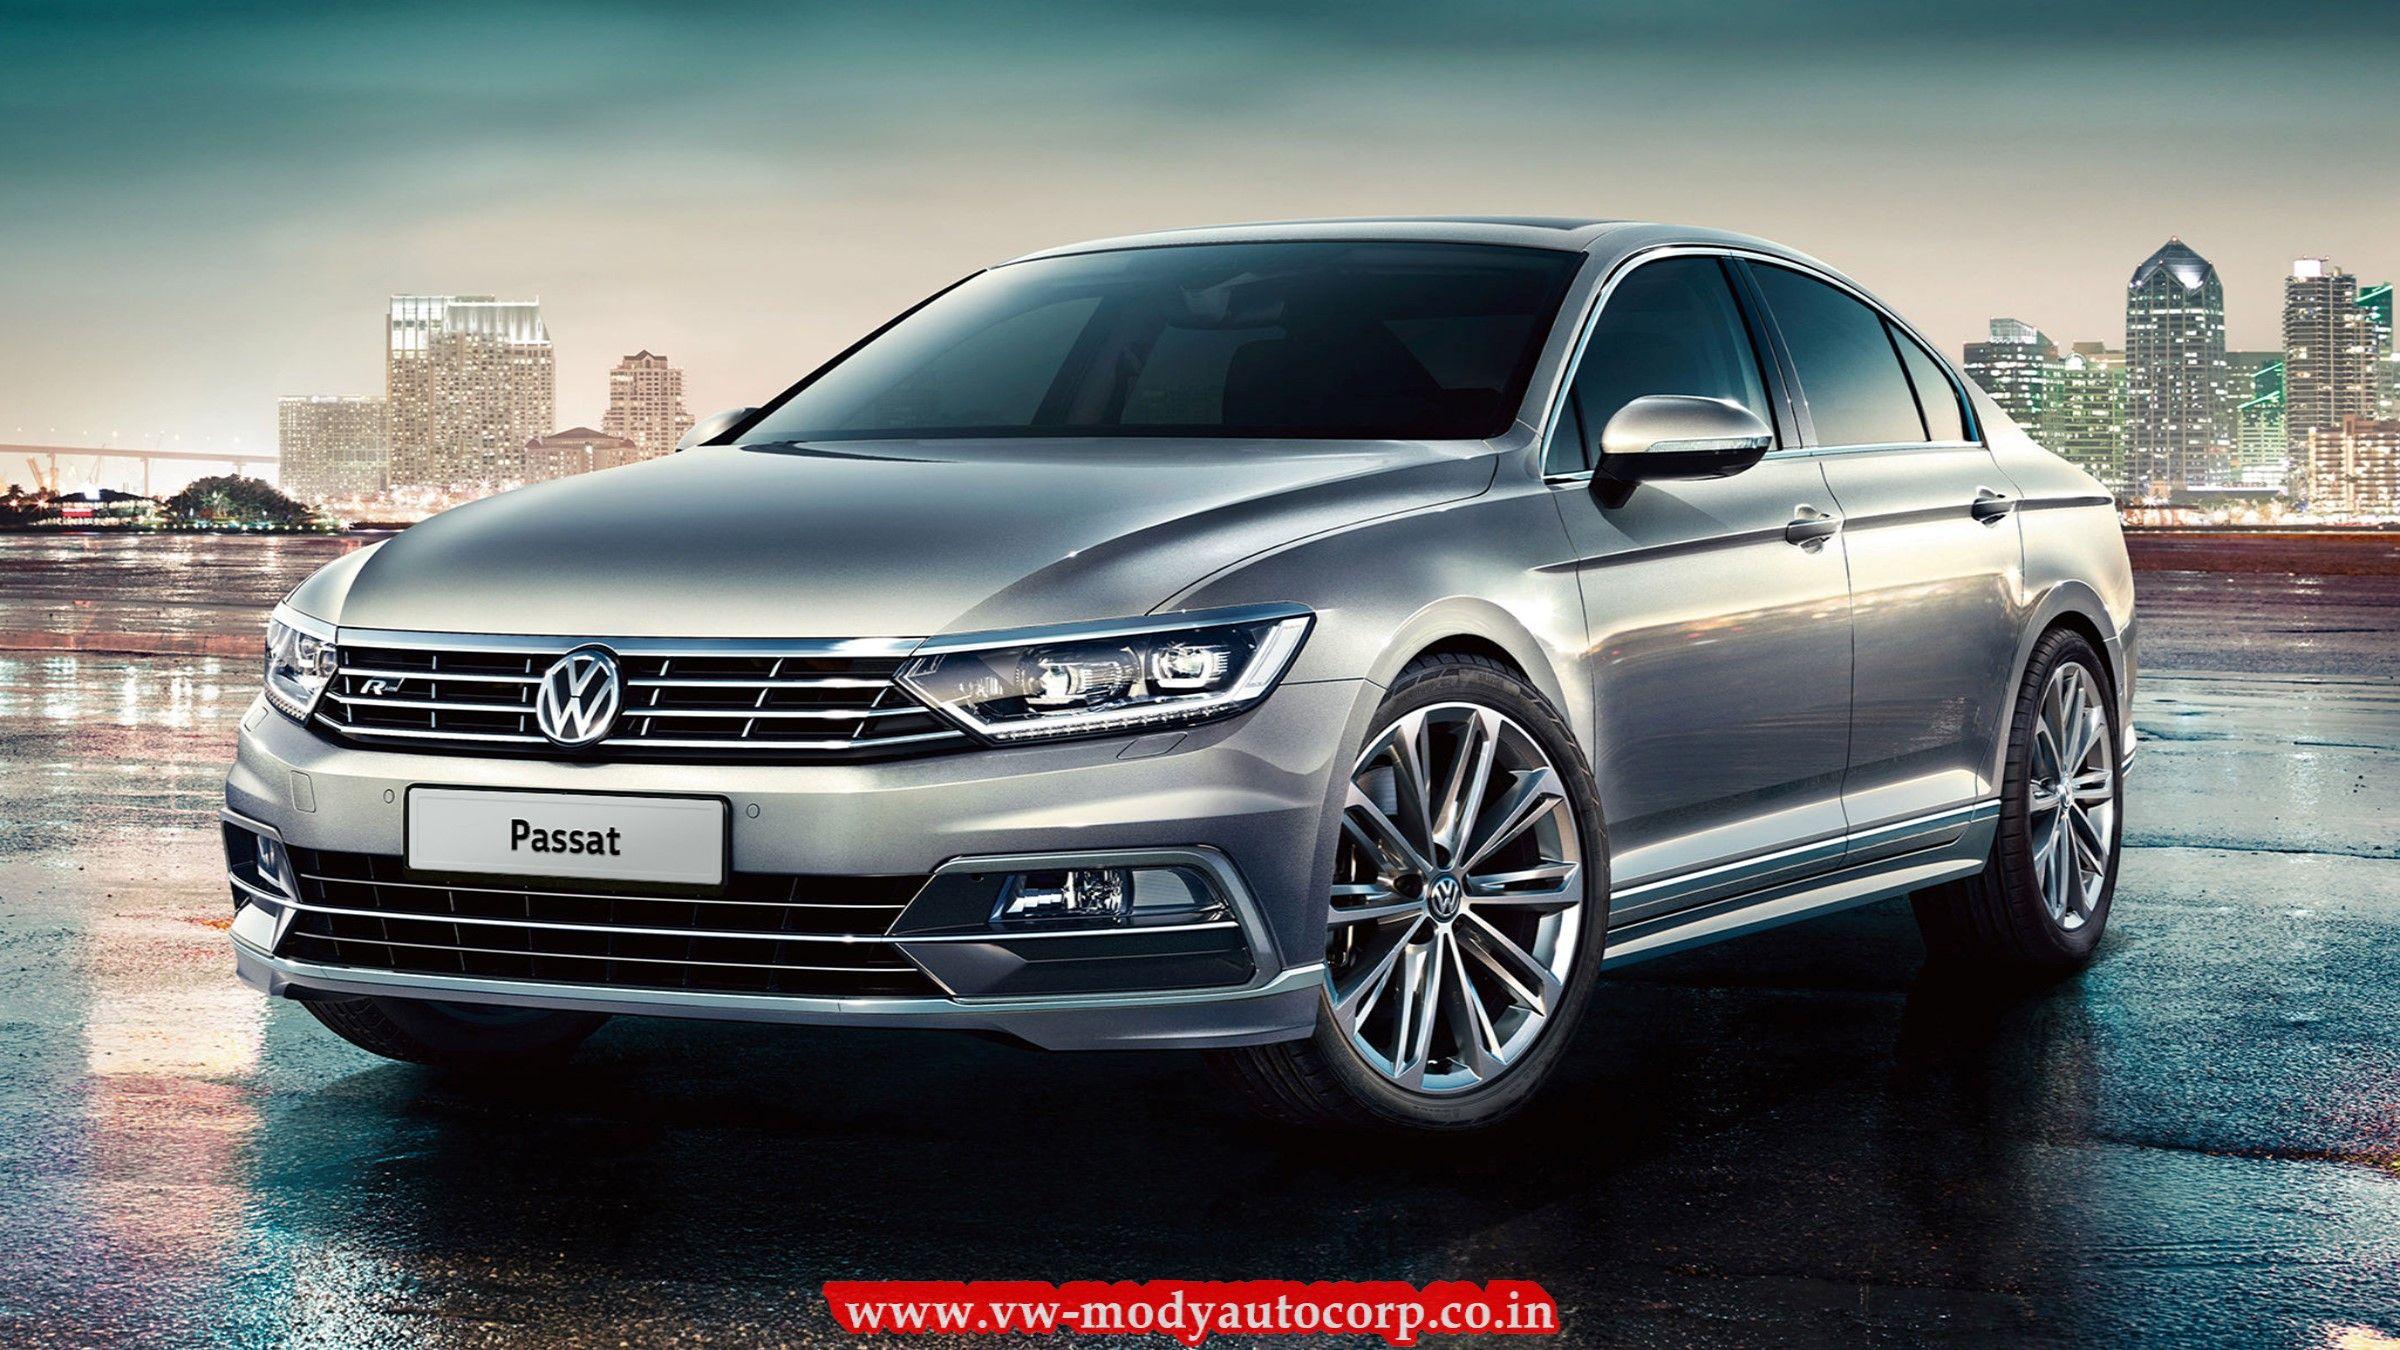 Sinsirella Tarafindan Cars Panosundaki Fikir 2020 Volkswagen Araba Yat